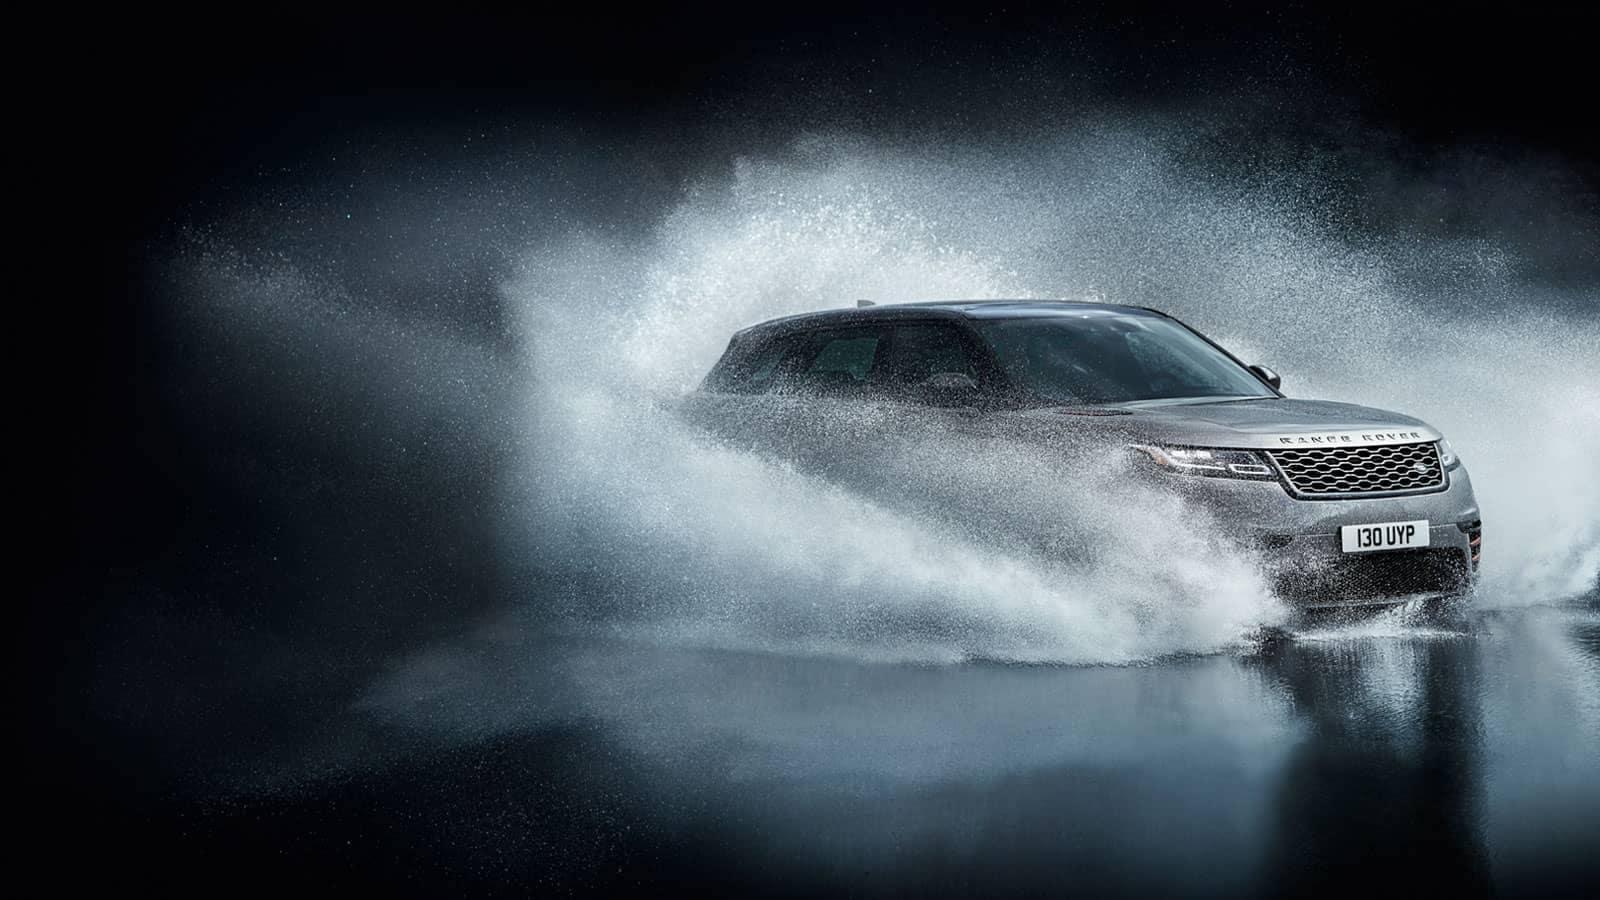 2019 Land Rover Range Rover Velar Driving Through Water